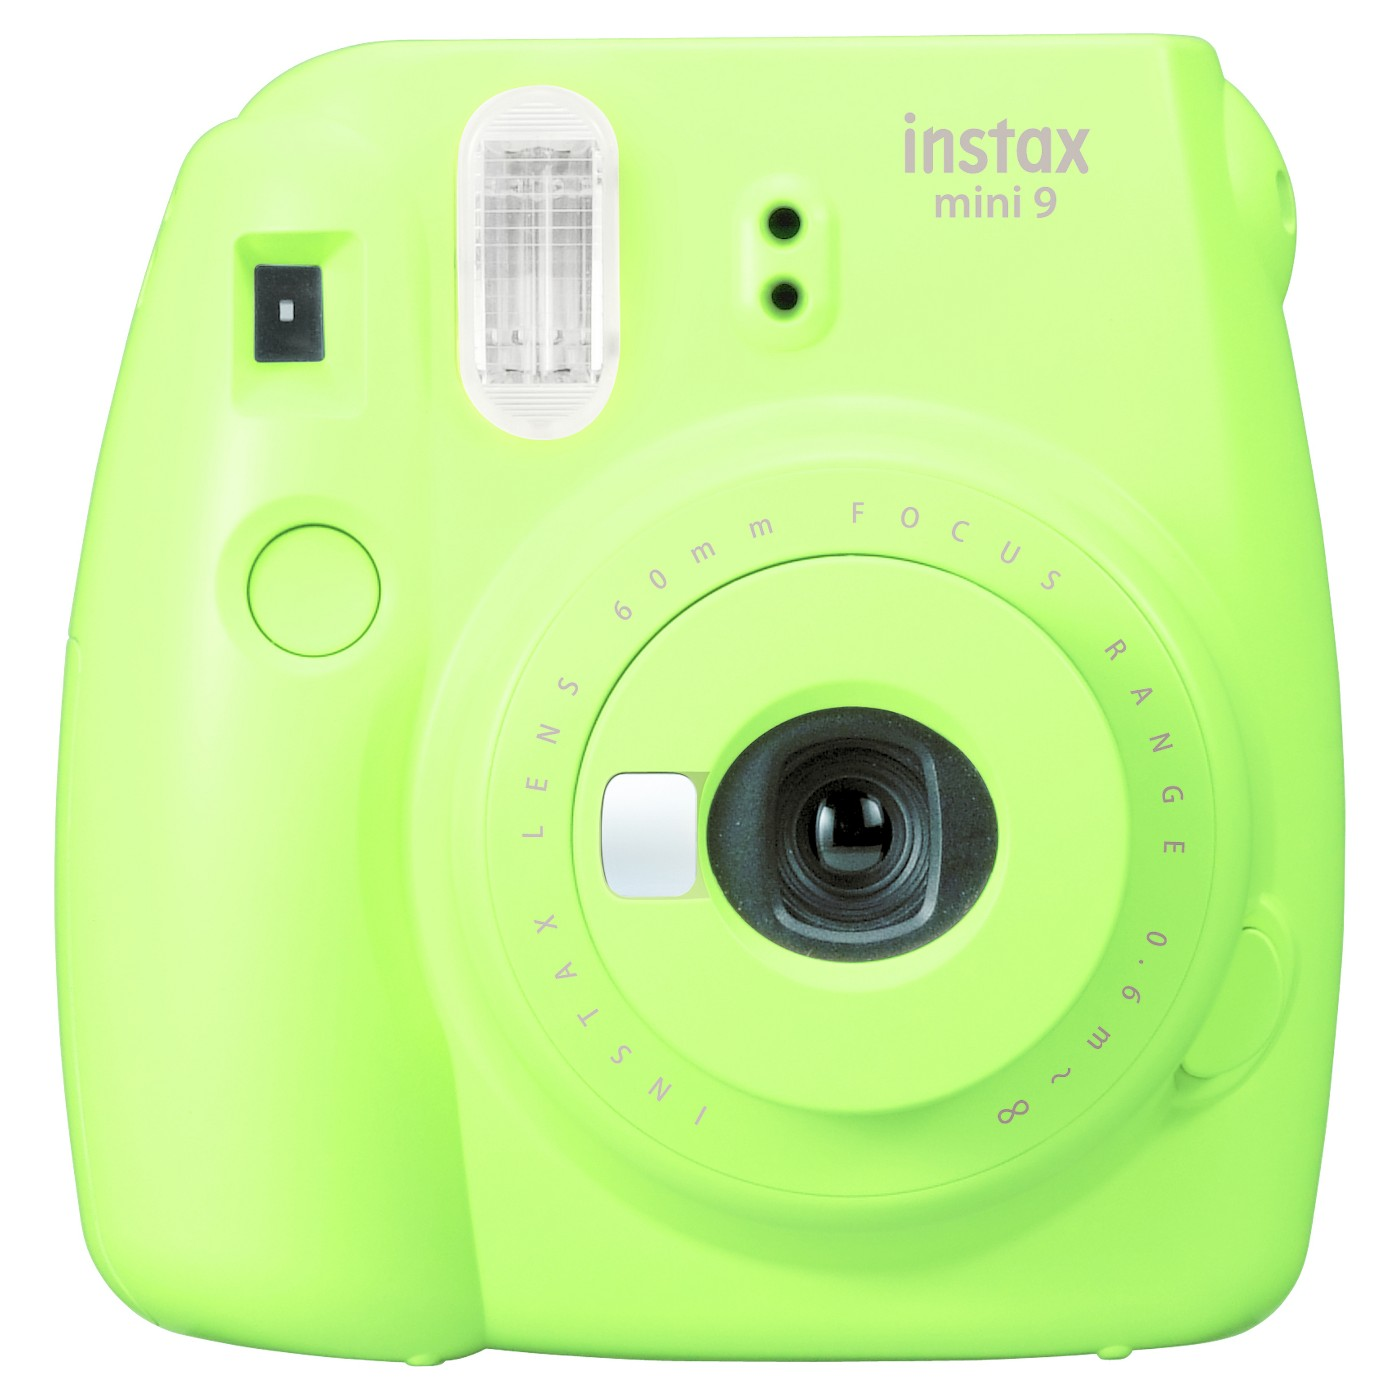 Fujifilm Instax Mini 9 Camera - image 1 of 7